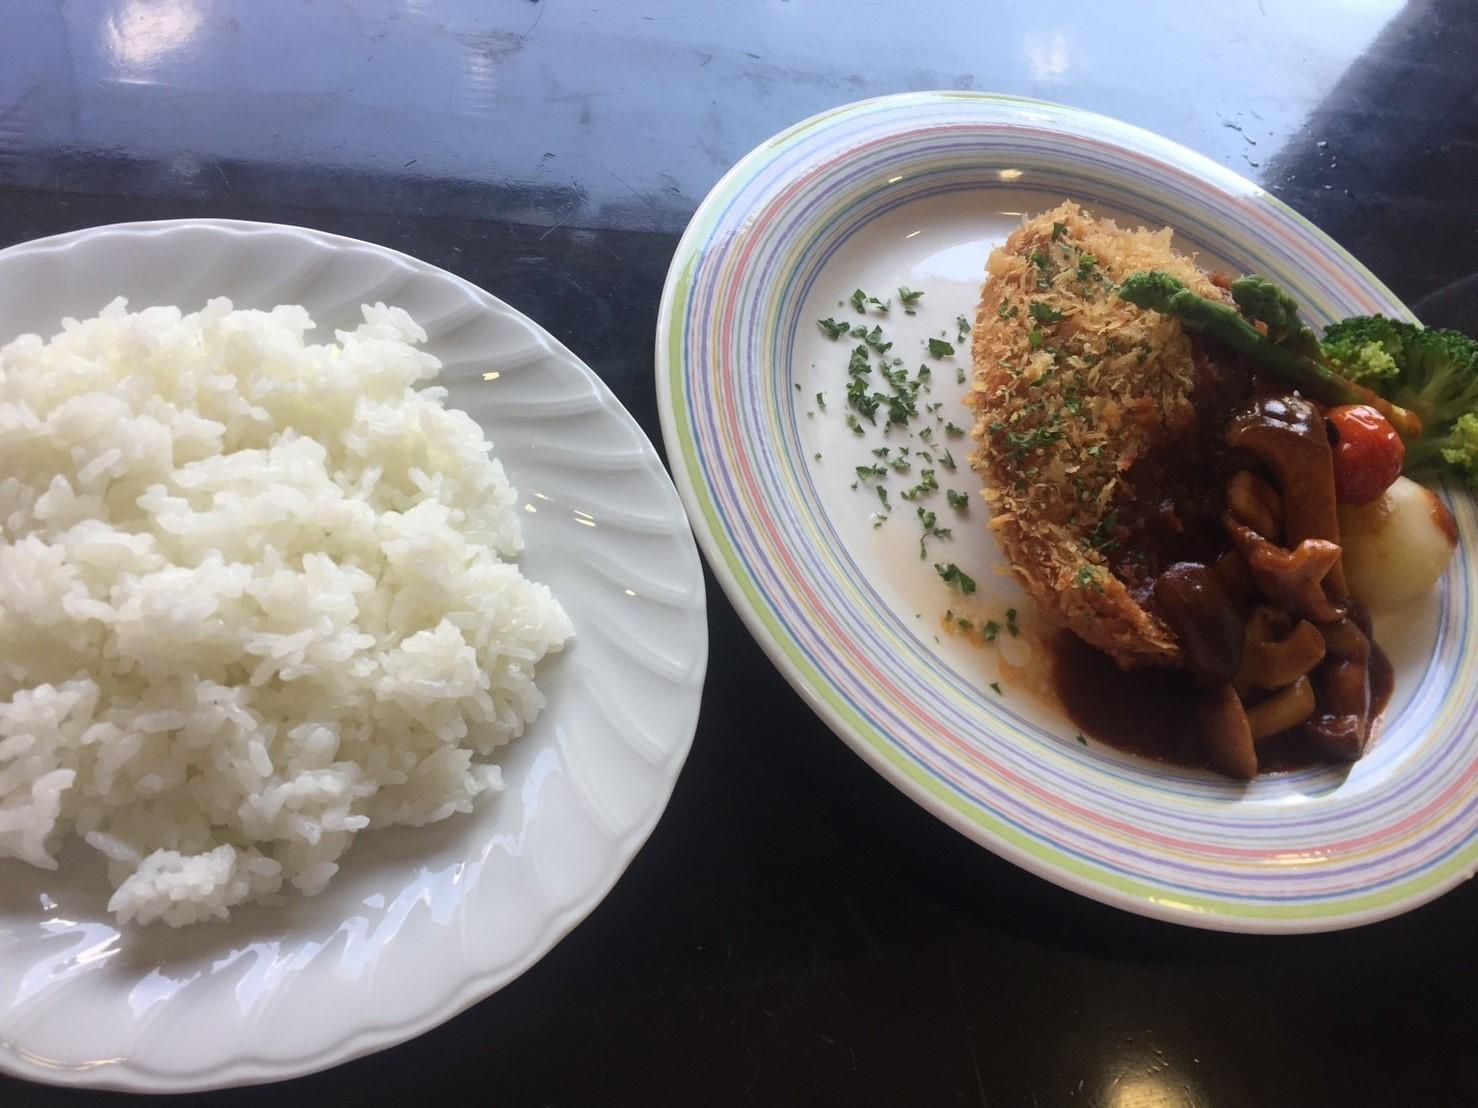 cafe & restaurant  アンドリュース  ポークチーズカツレツ_e0115904_14353348.jpg